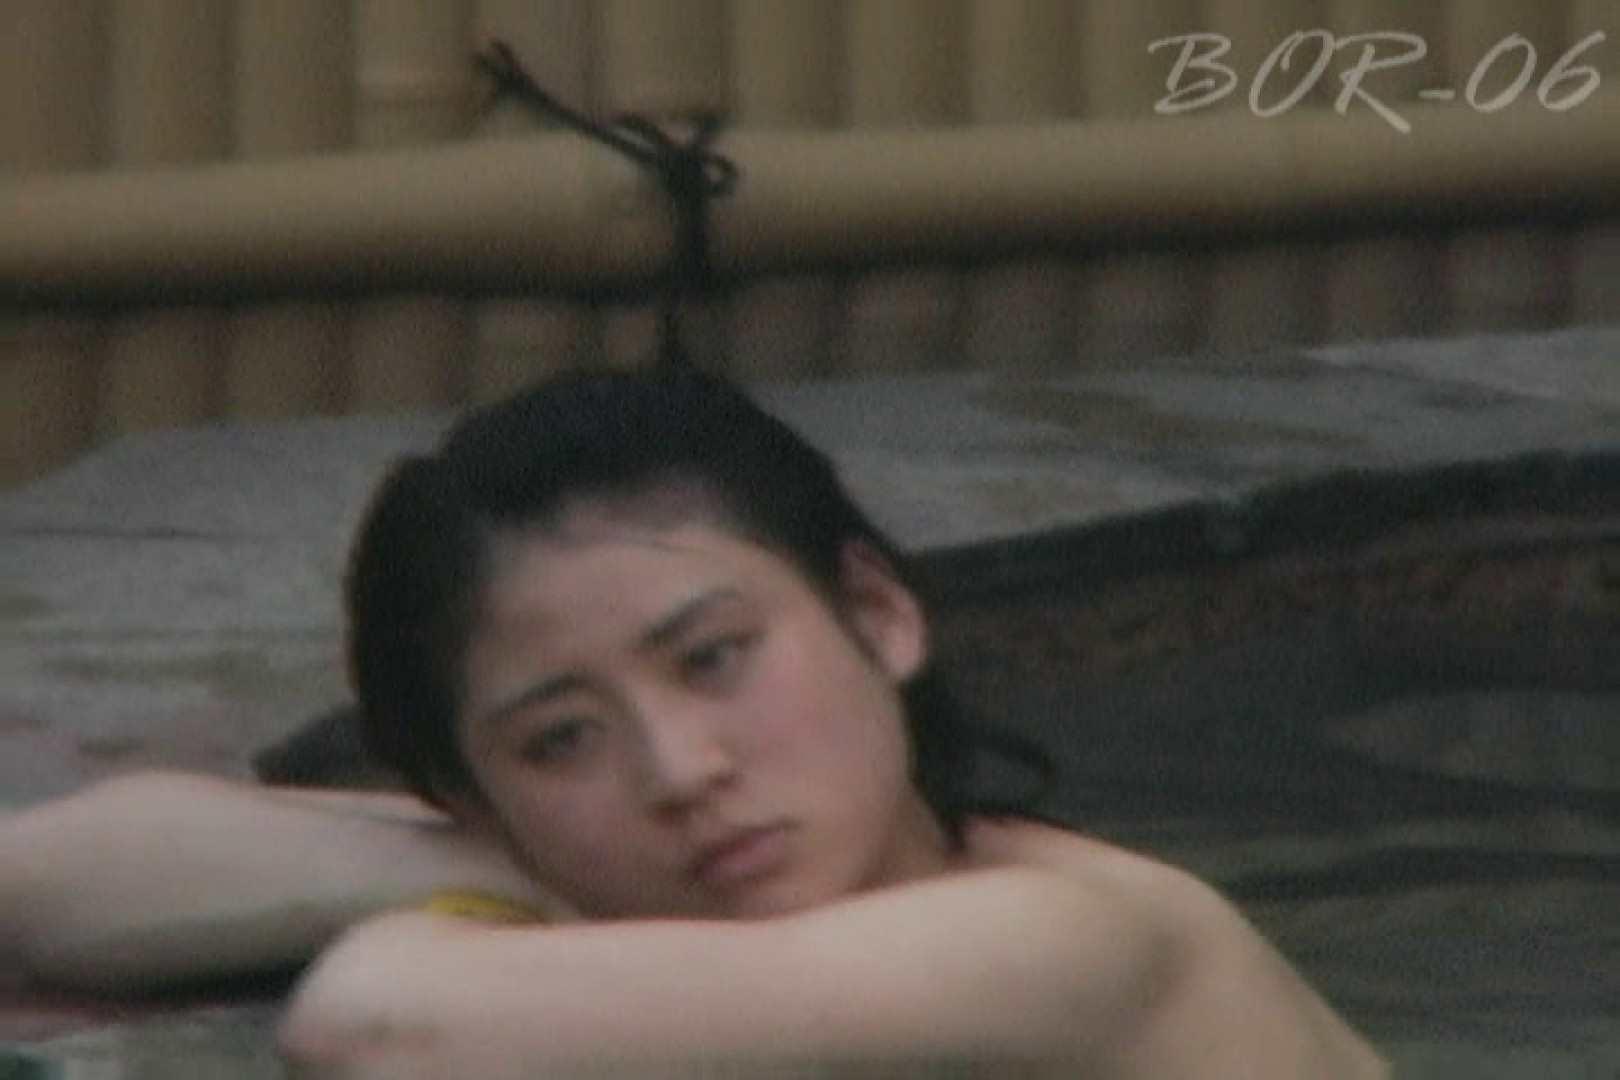 Aquaな露天風呂Vol.520 OL女体  52連発 42